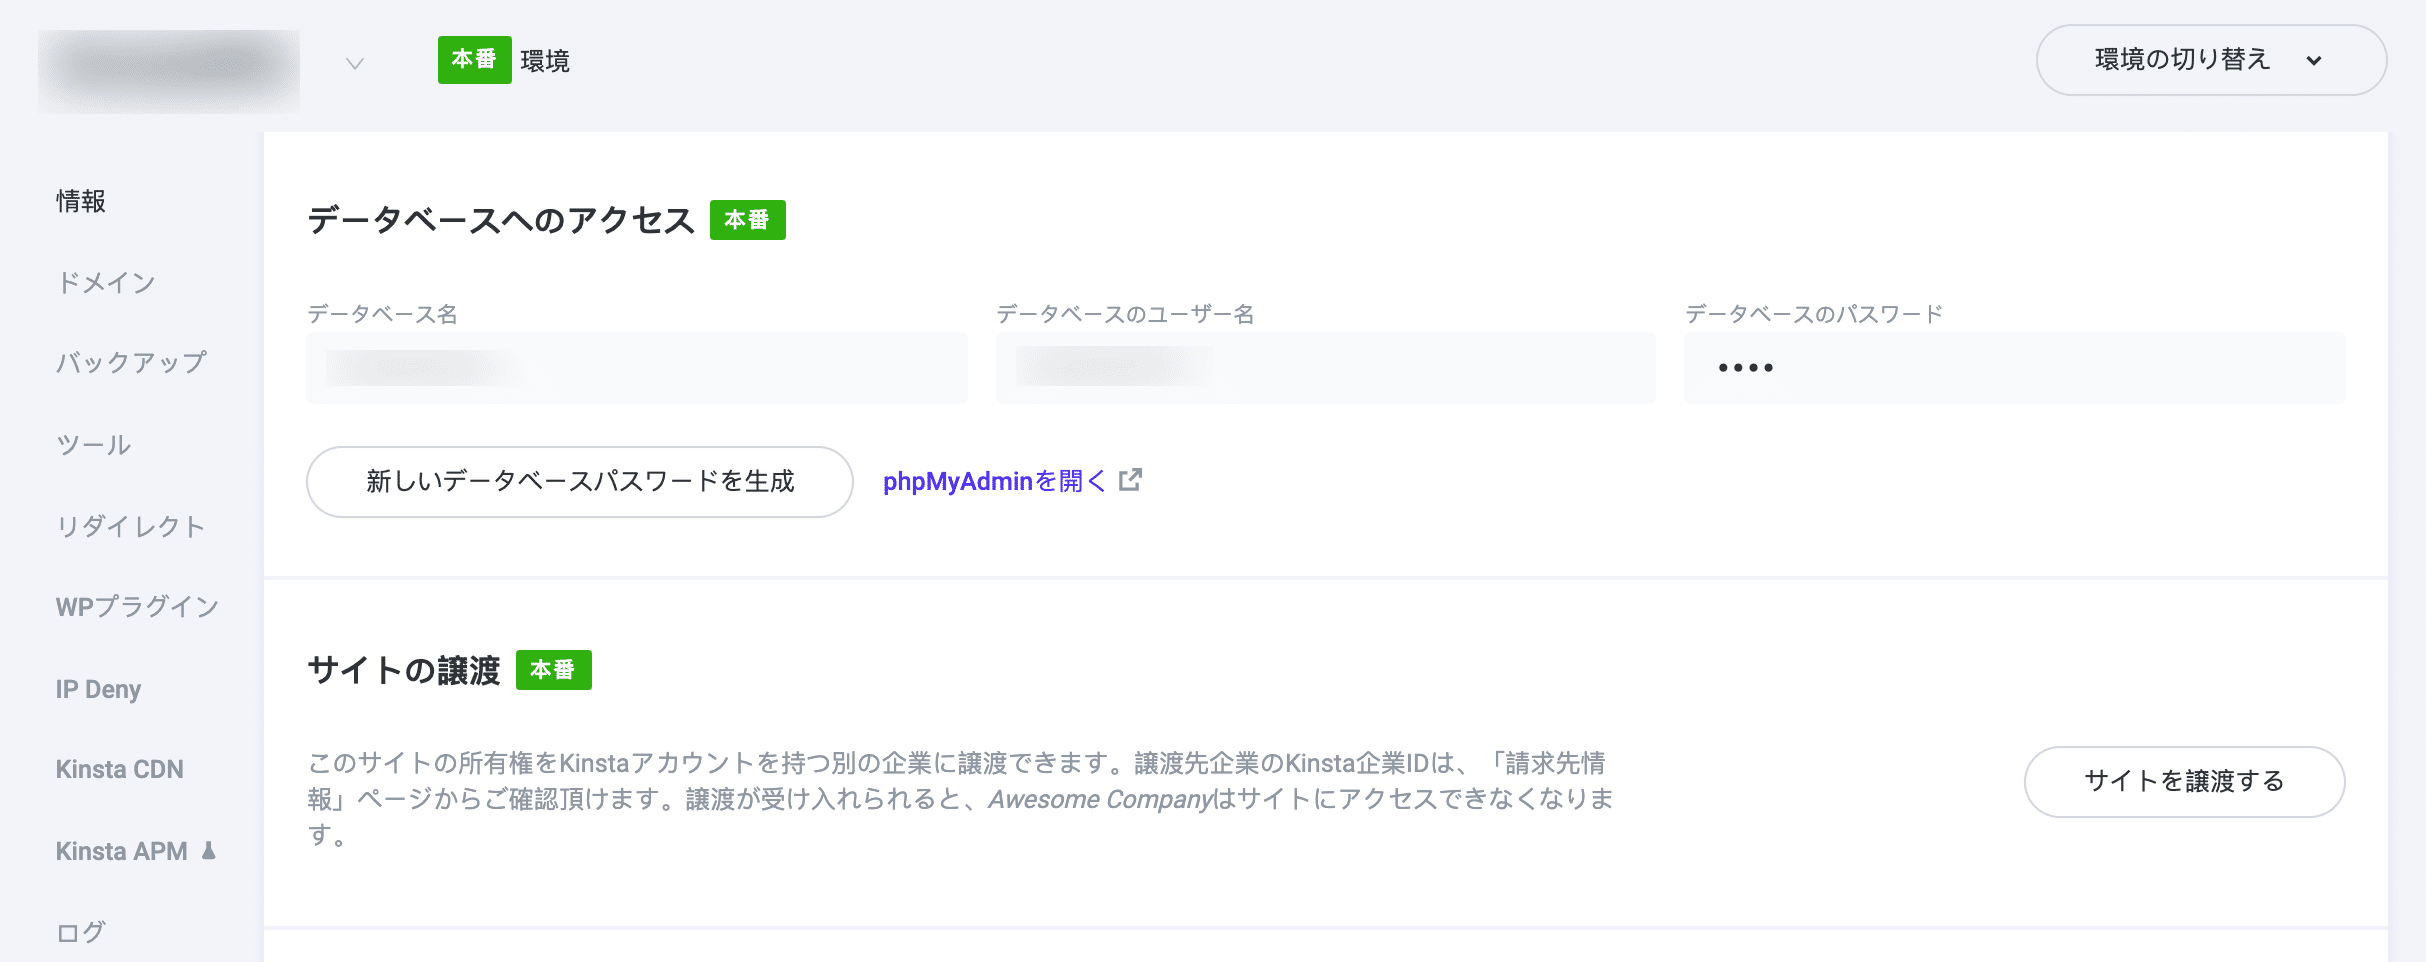 MyKinstaの「情報」タブ